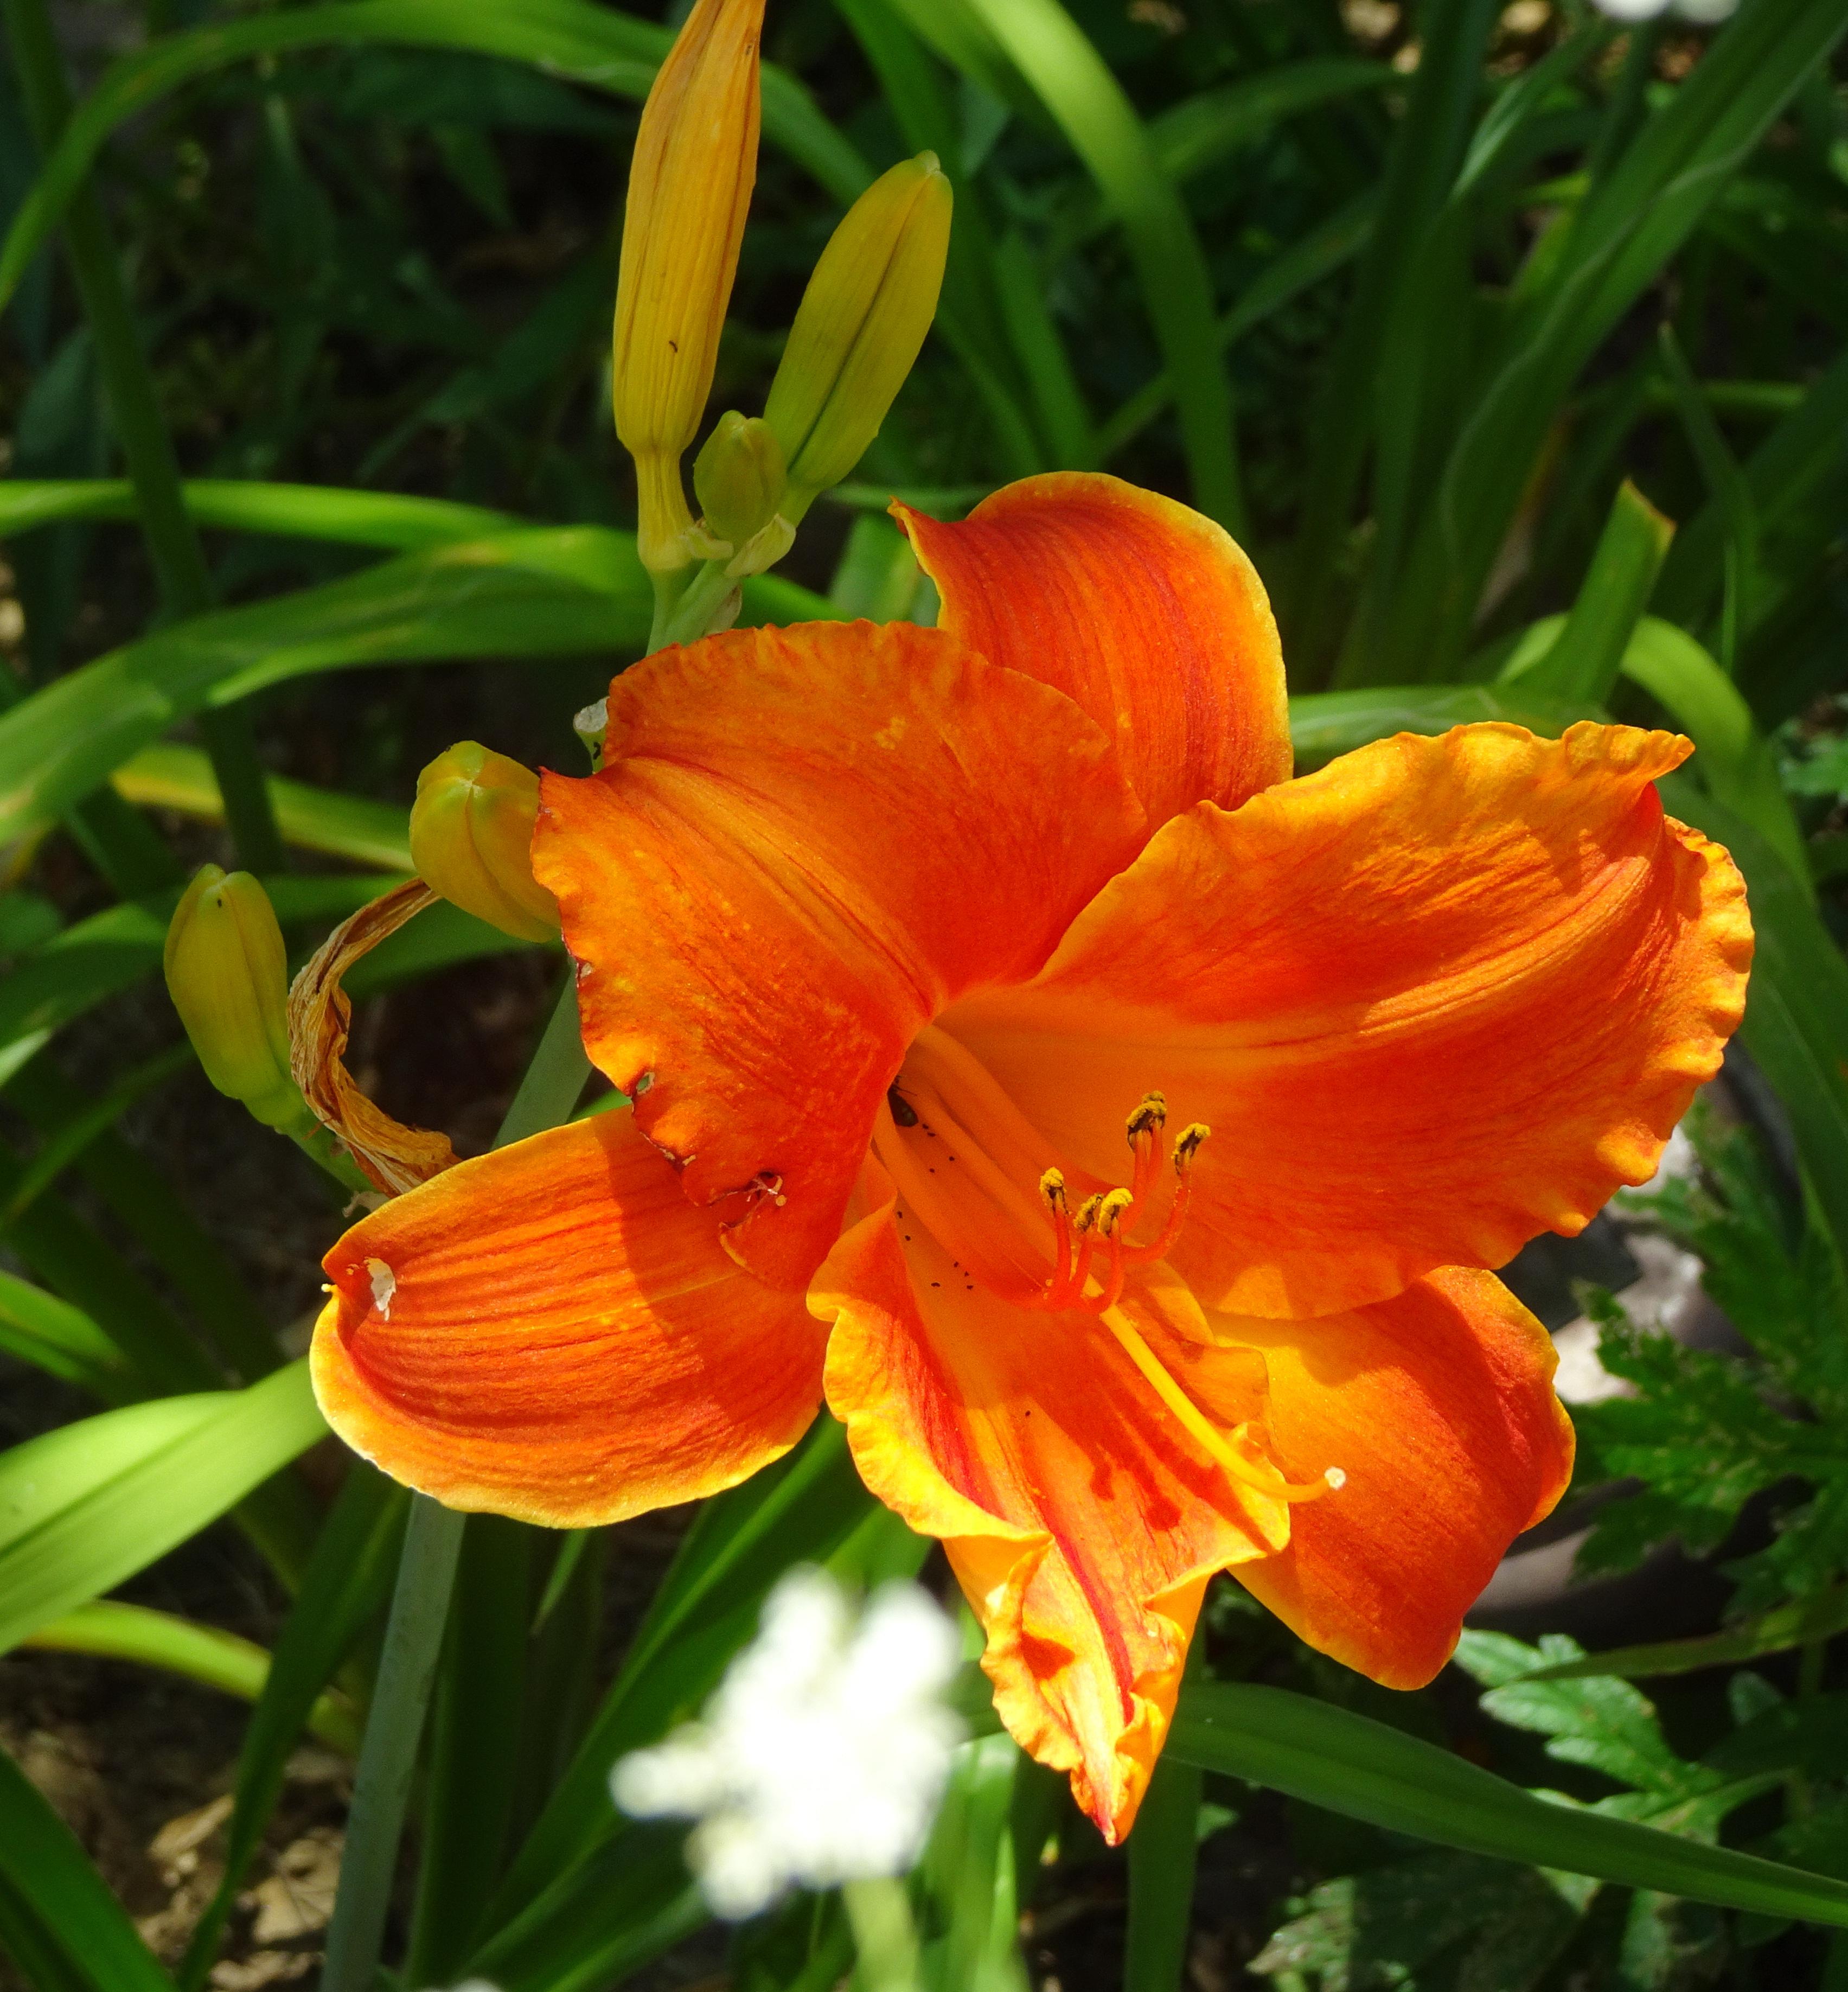 orange red very nice lily